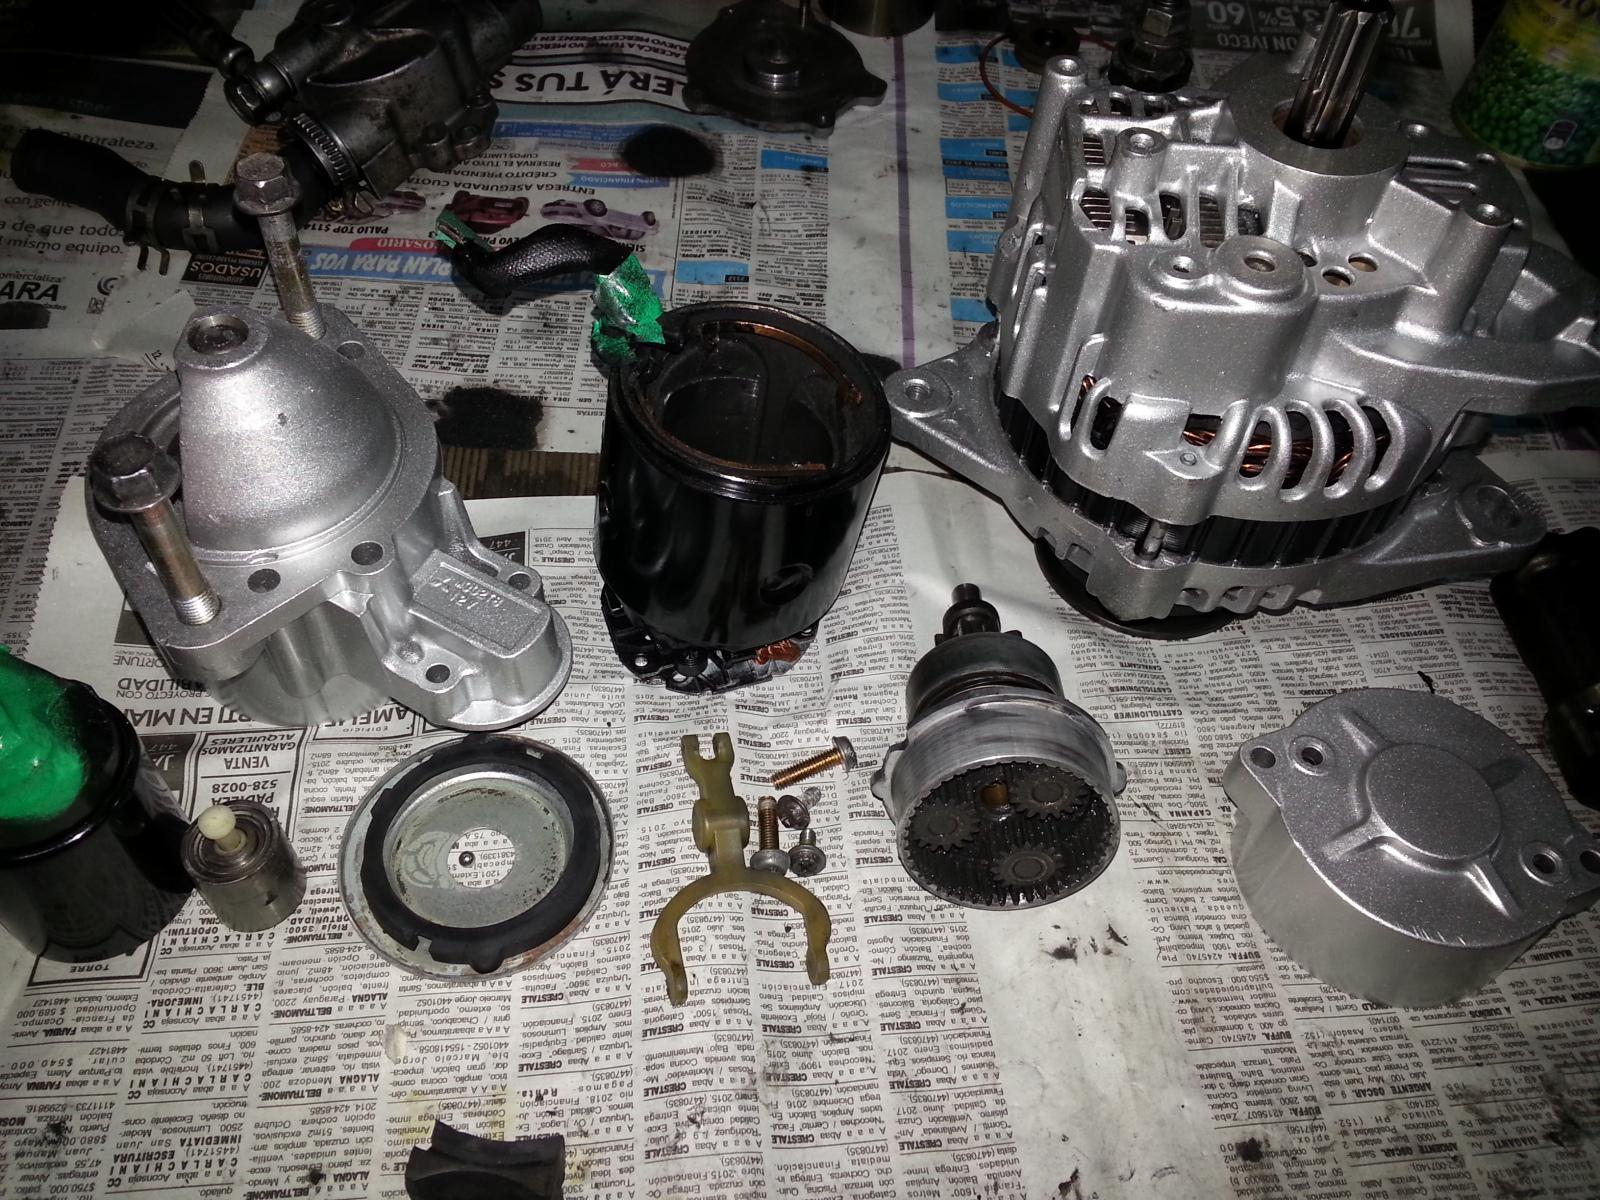 Bulbos sensores Rk6914